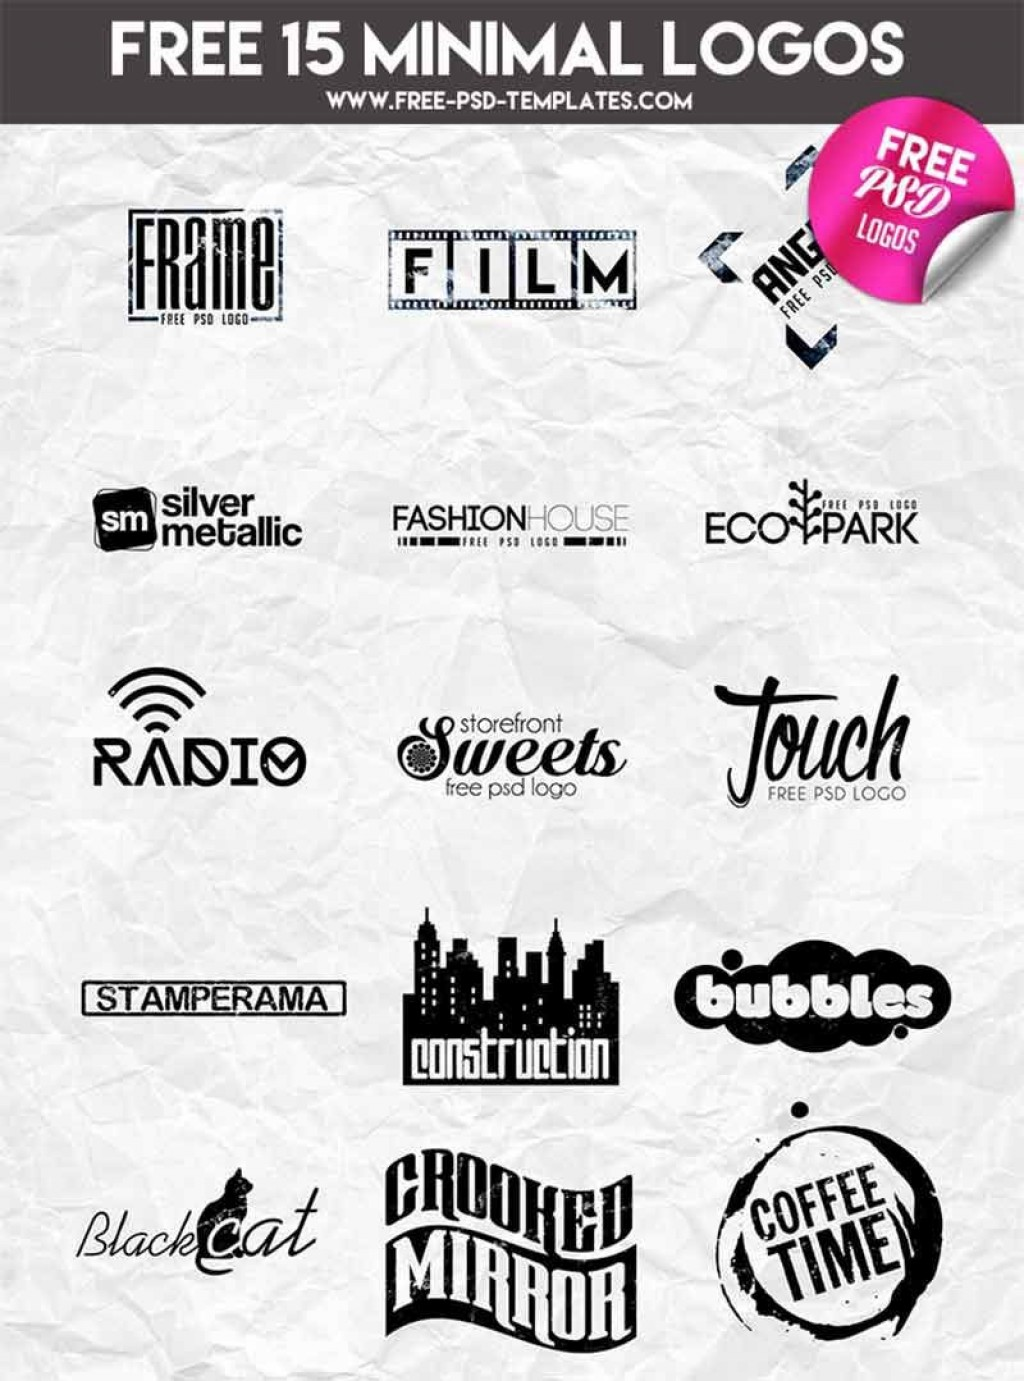 000 Impressive Free Psd Logo Template High Definition  Templates Design For Photographer DjLarge